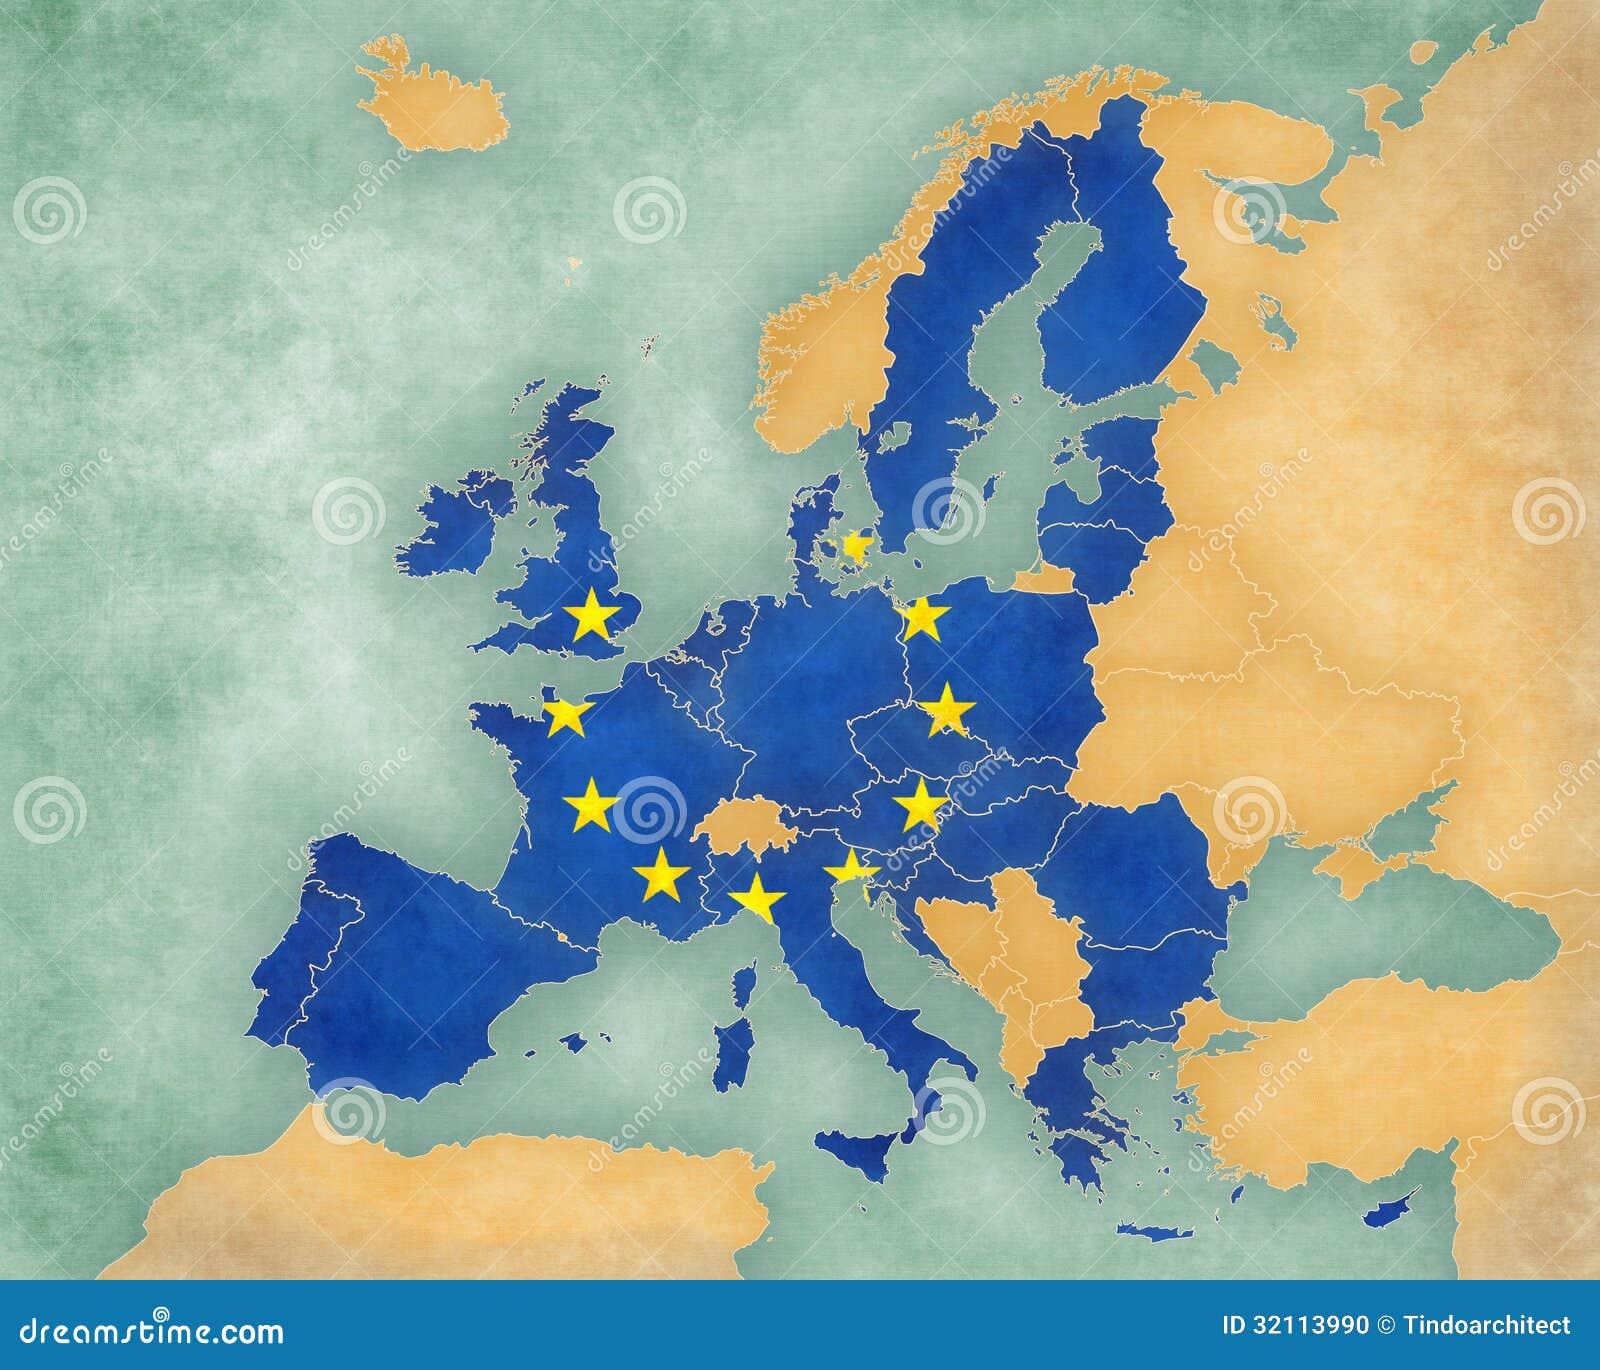 Map Of Europe - European Union 2013 (summer Style) Stock ...